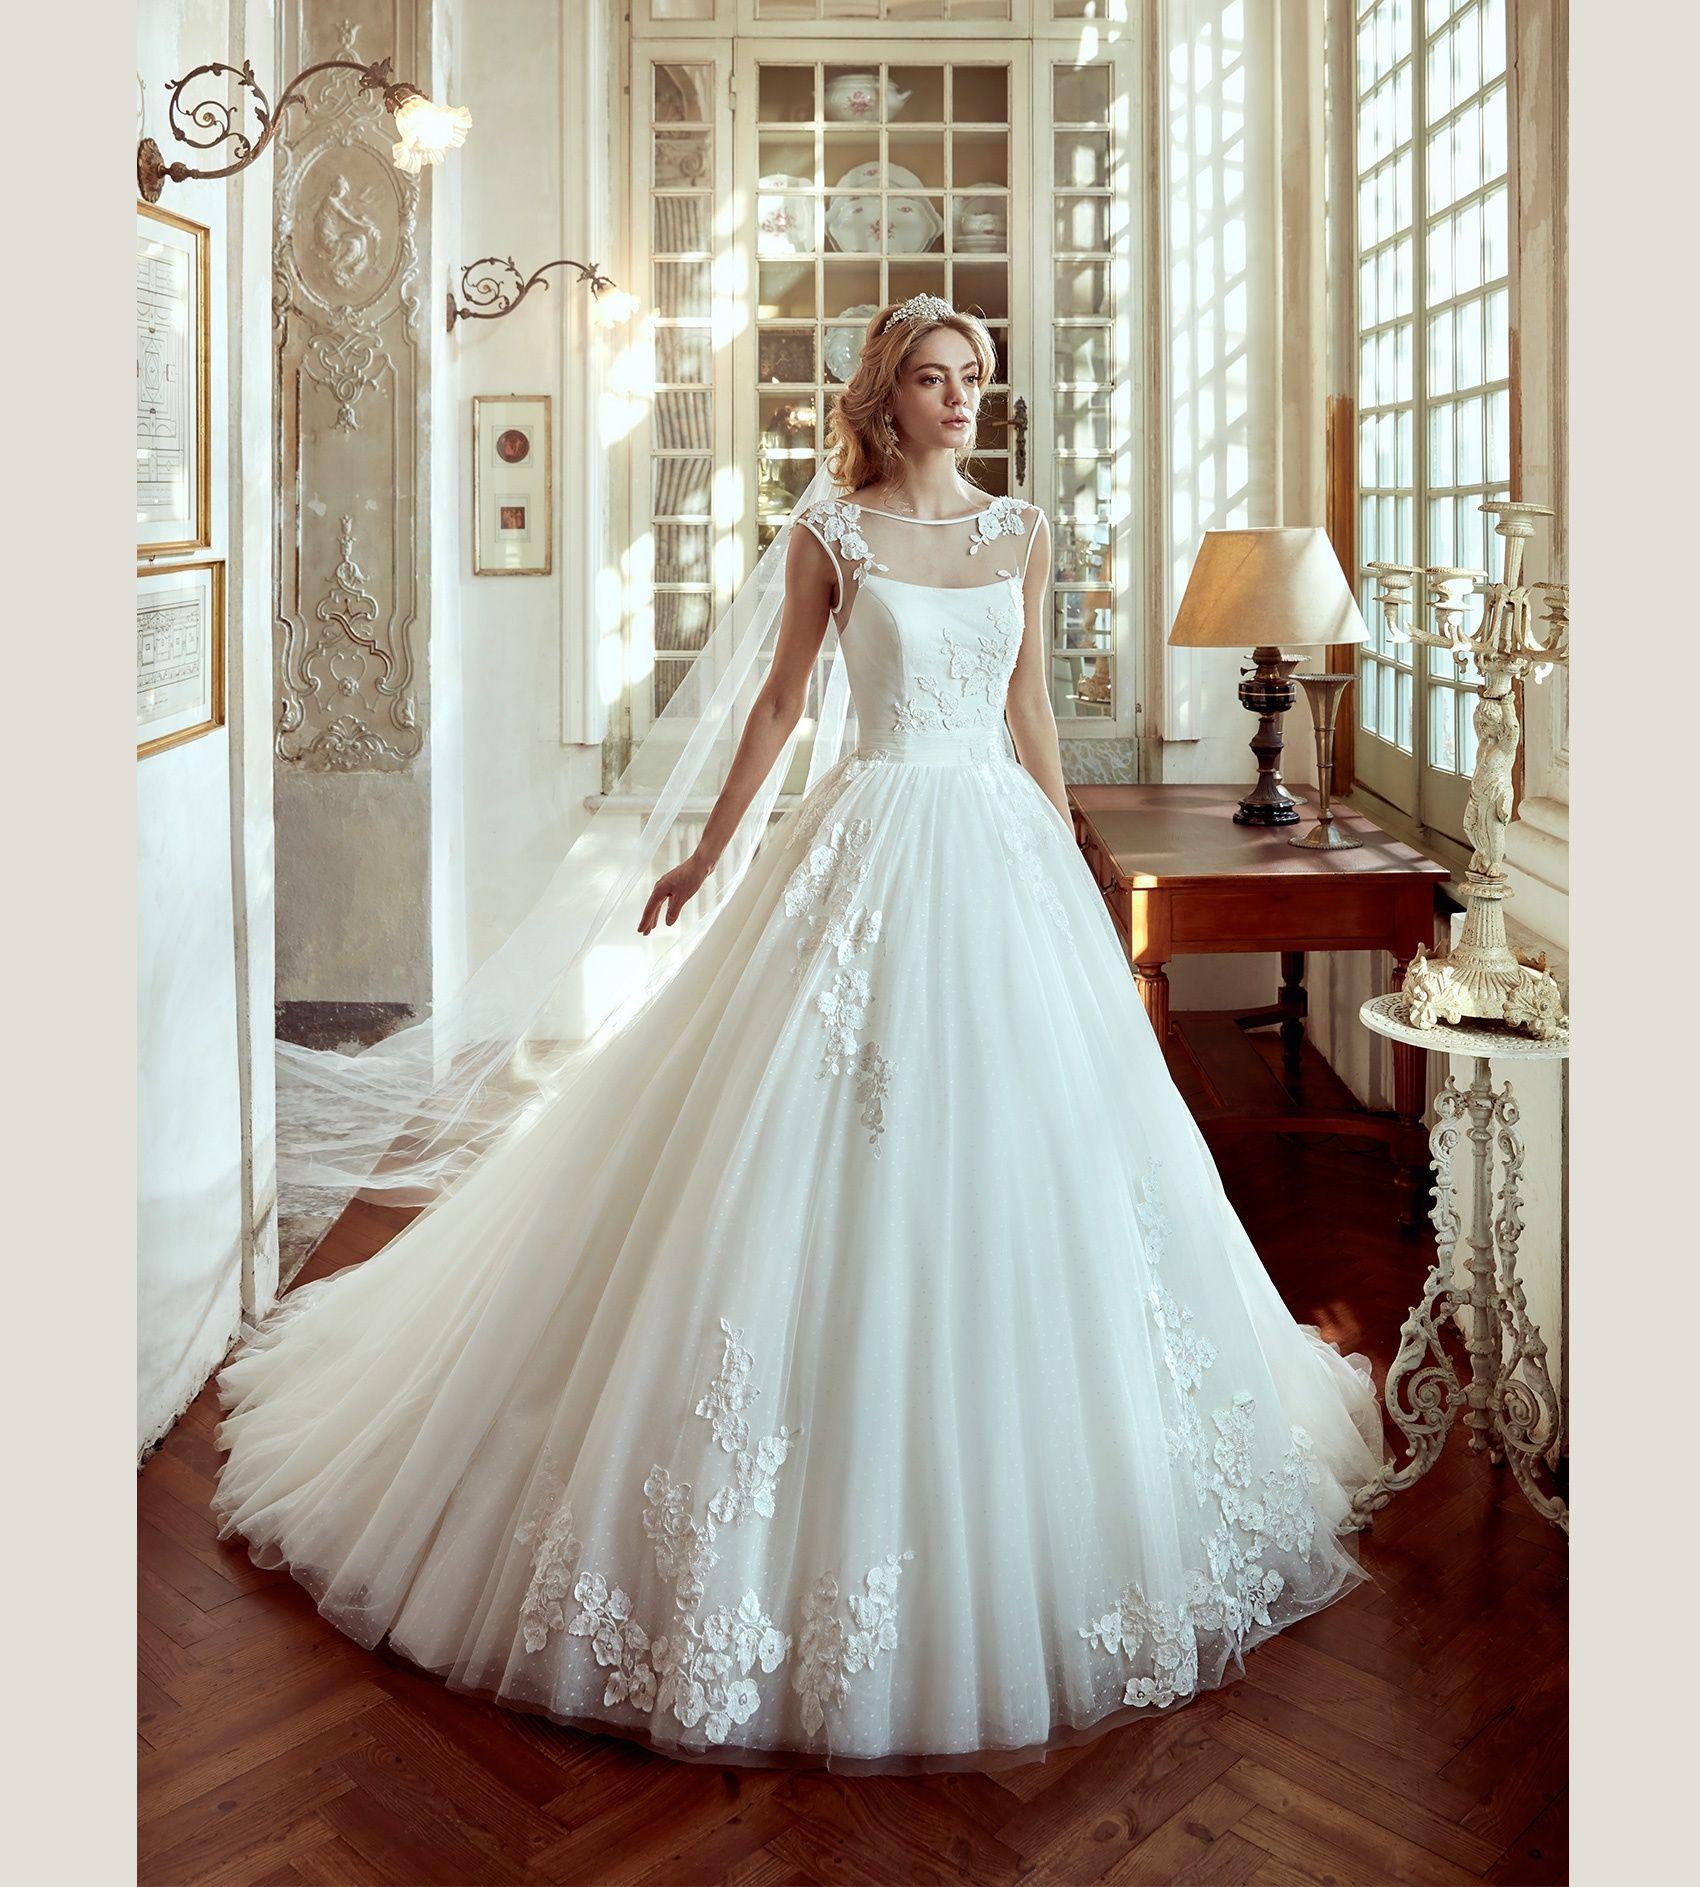 Moda sposa kollektion nicole niab abito da sposa